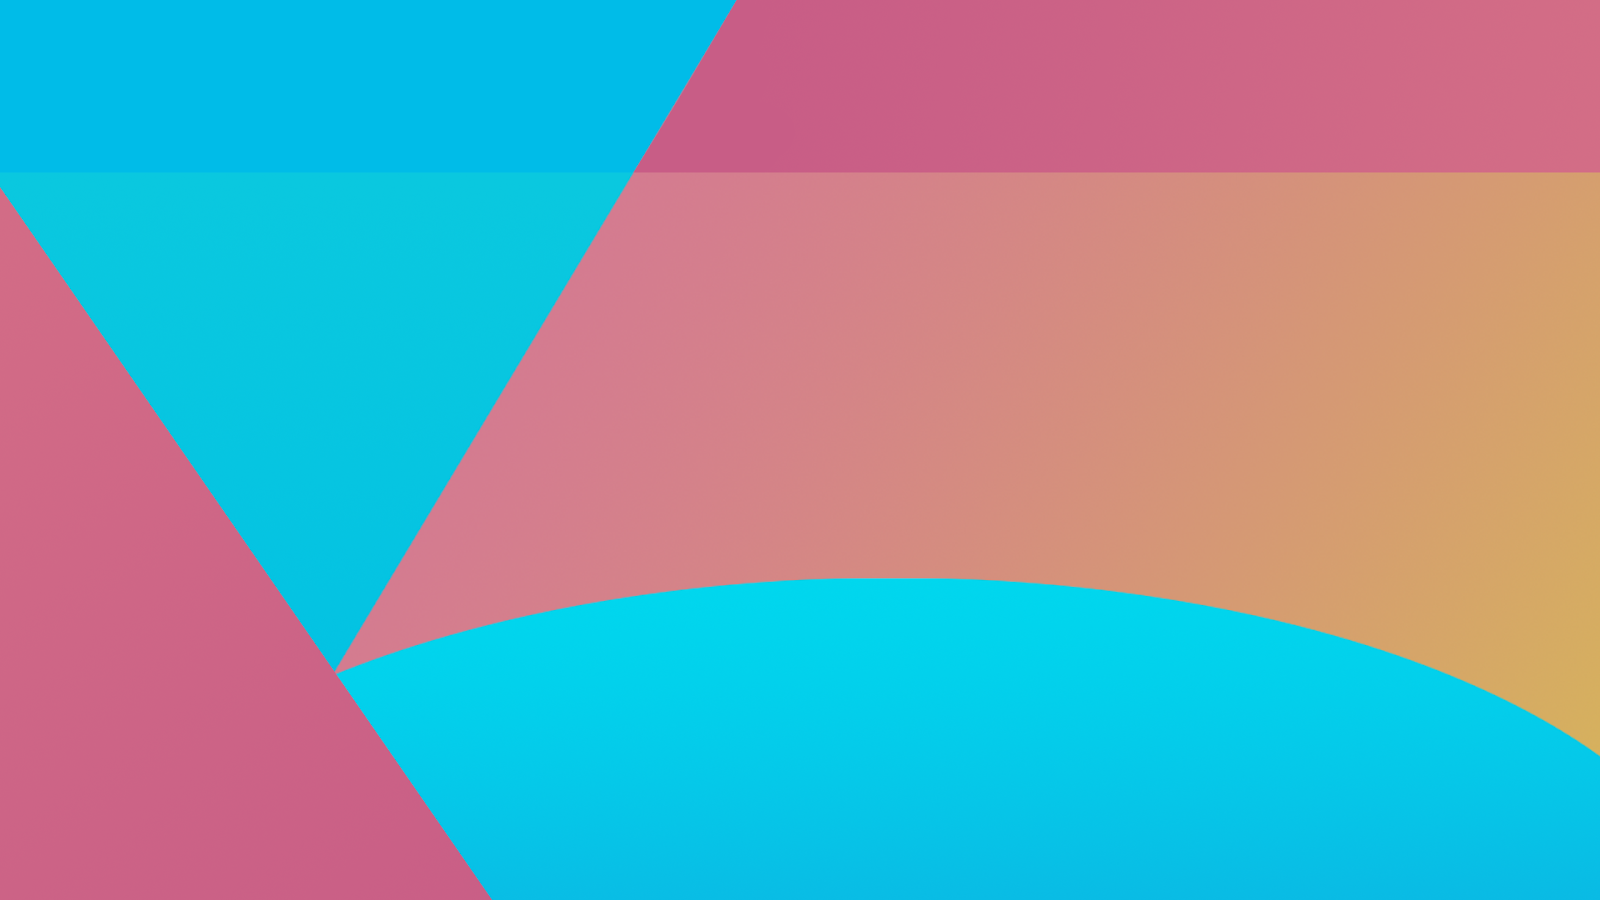 Android Kit Kat Wallpaper